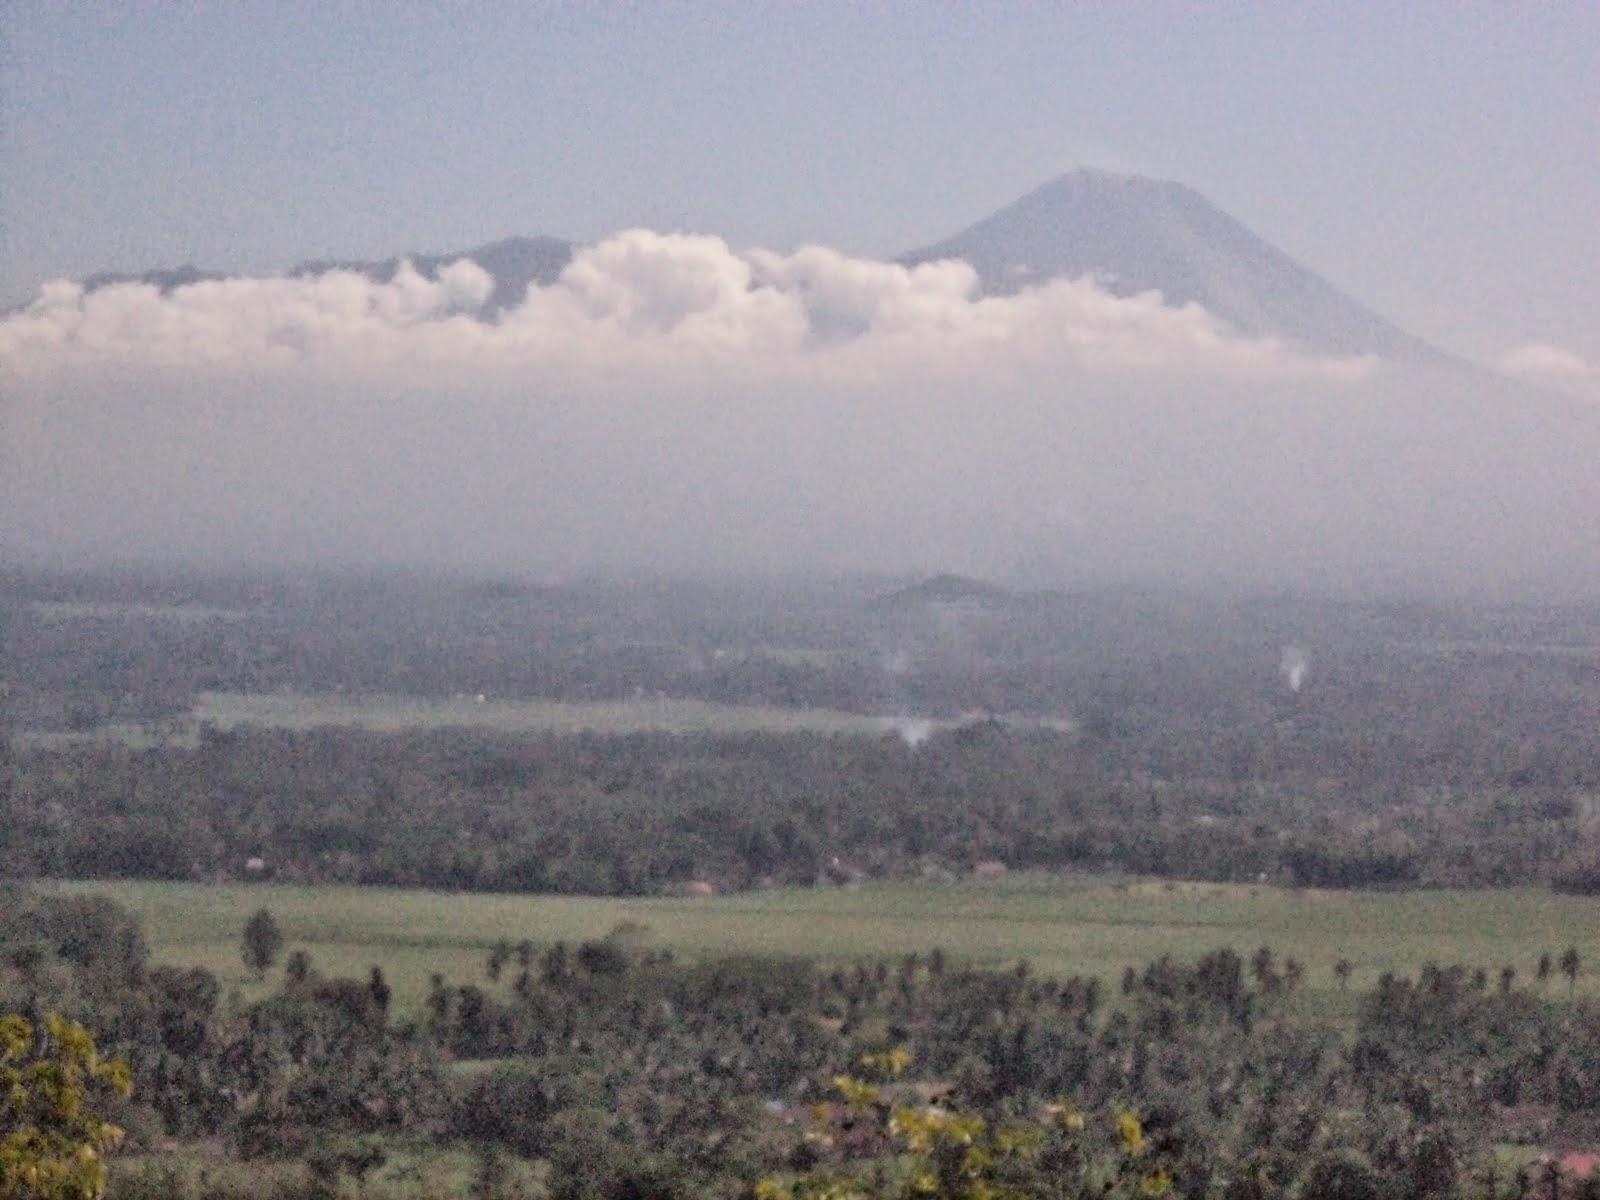 Tempat Wisata Gunung Geger Www Karimatafm Net Sebenarnya Bukit Menjulang